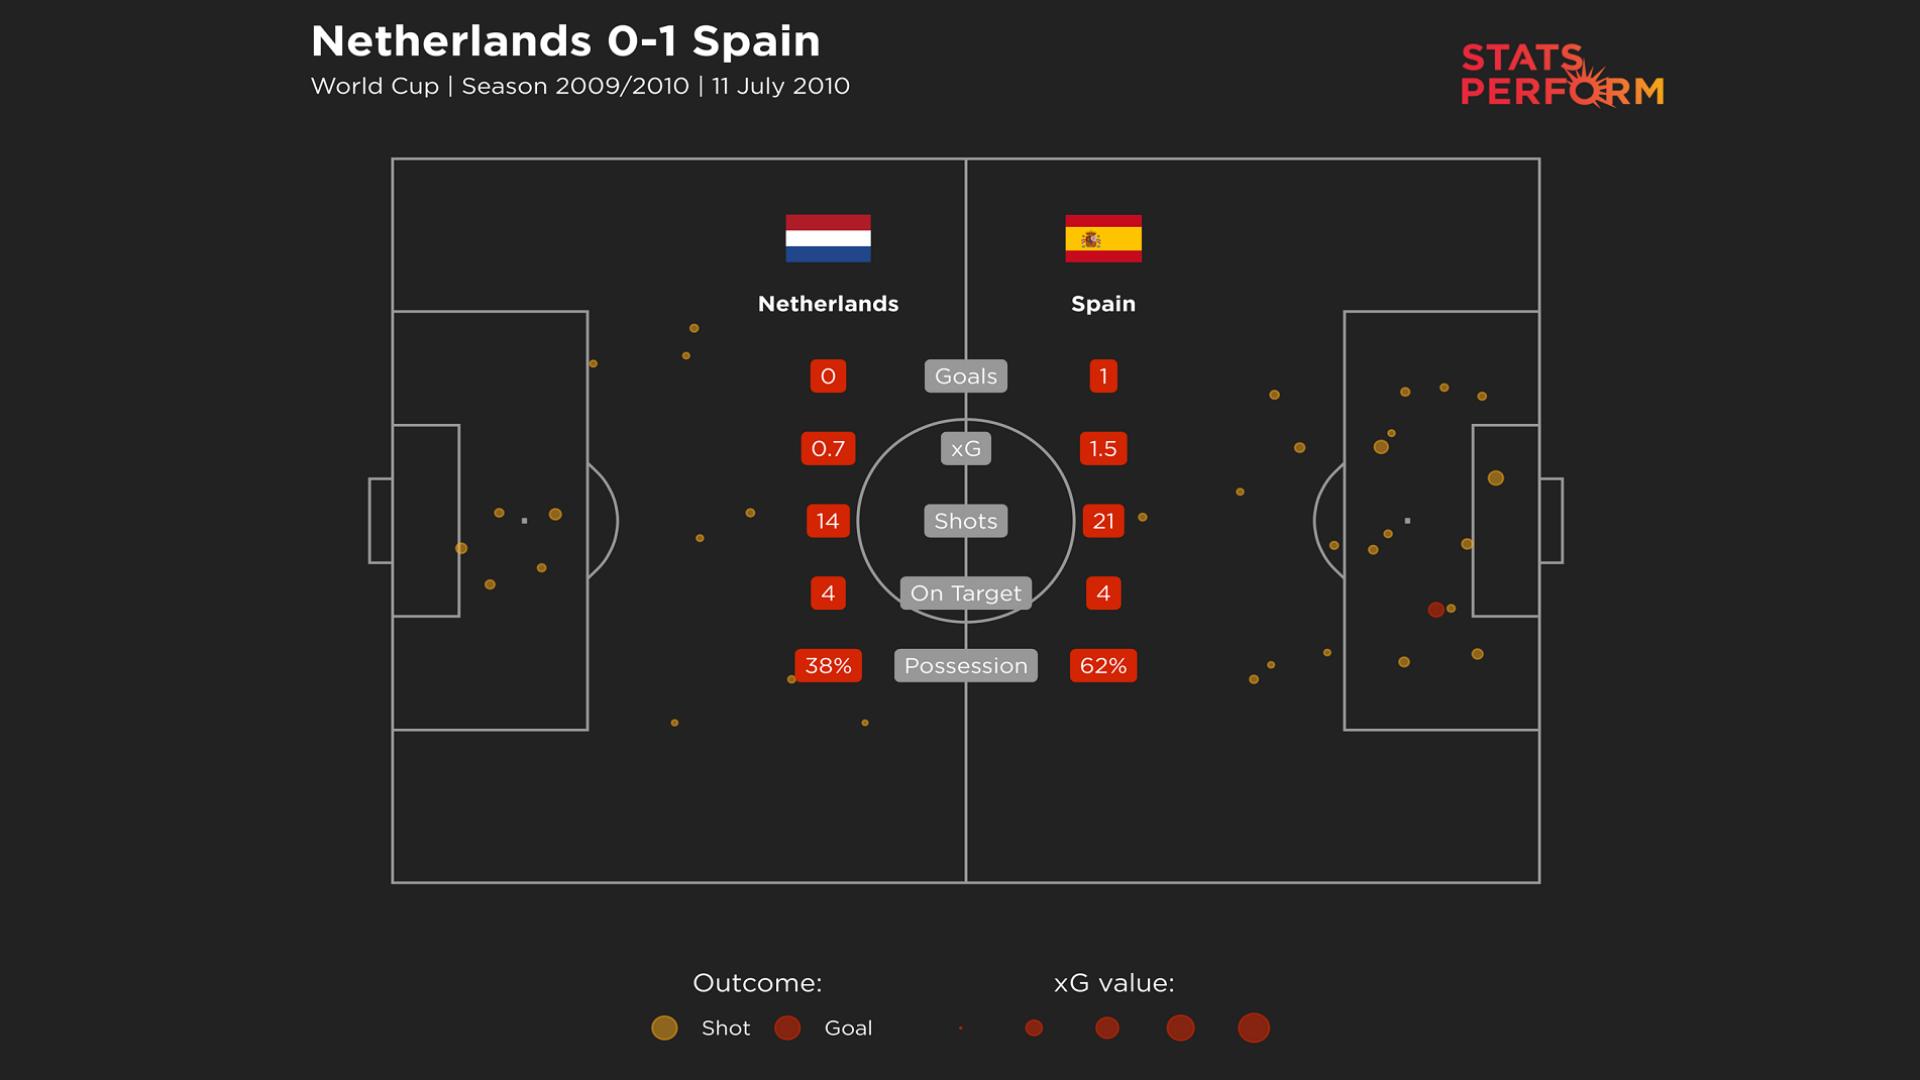 Netherlands 0-1 Spain